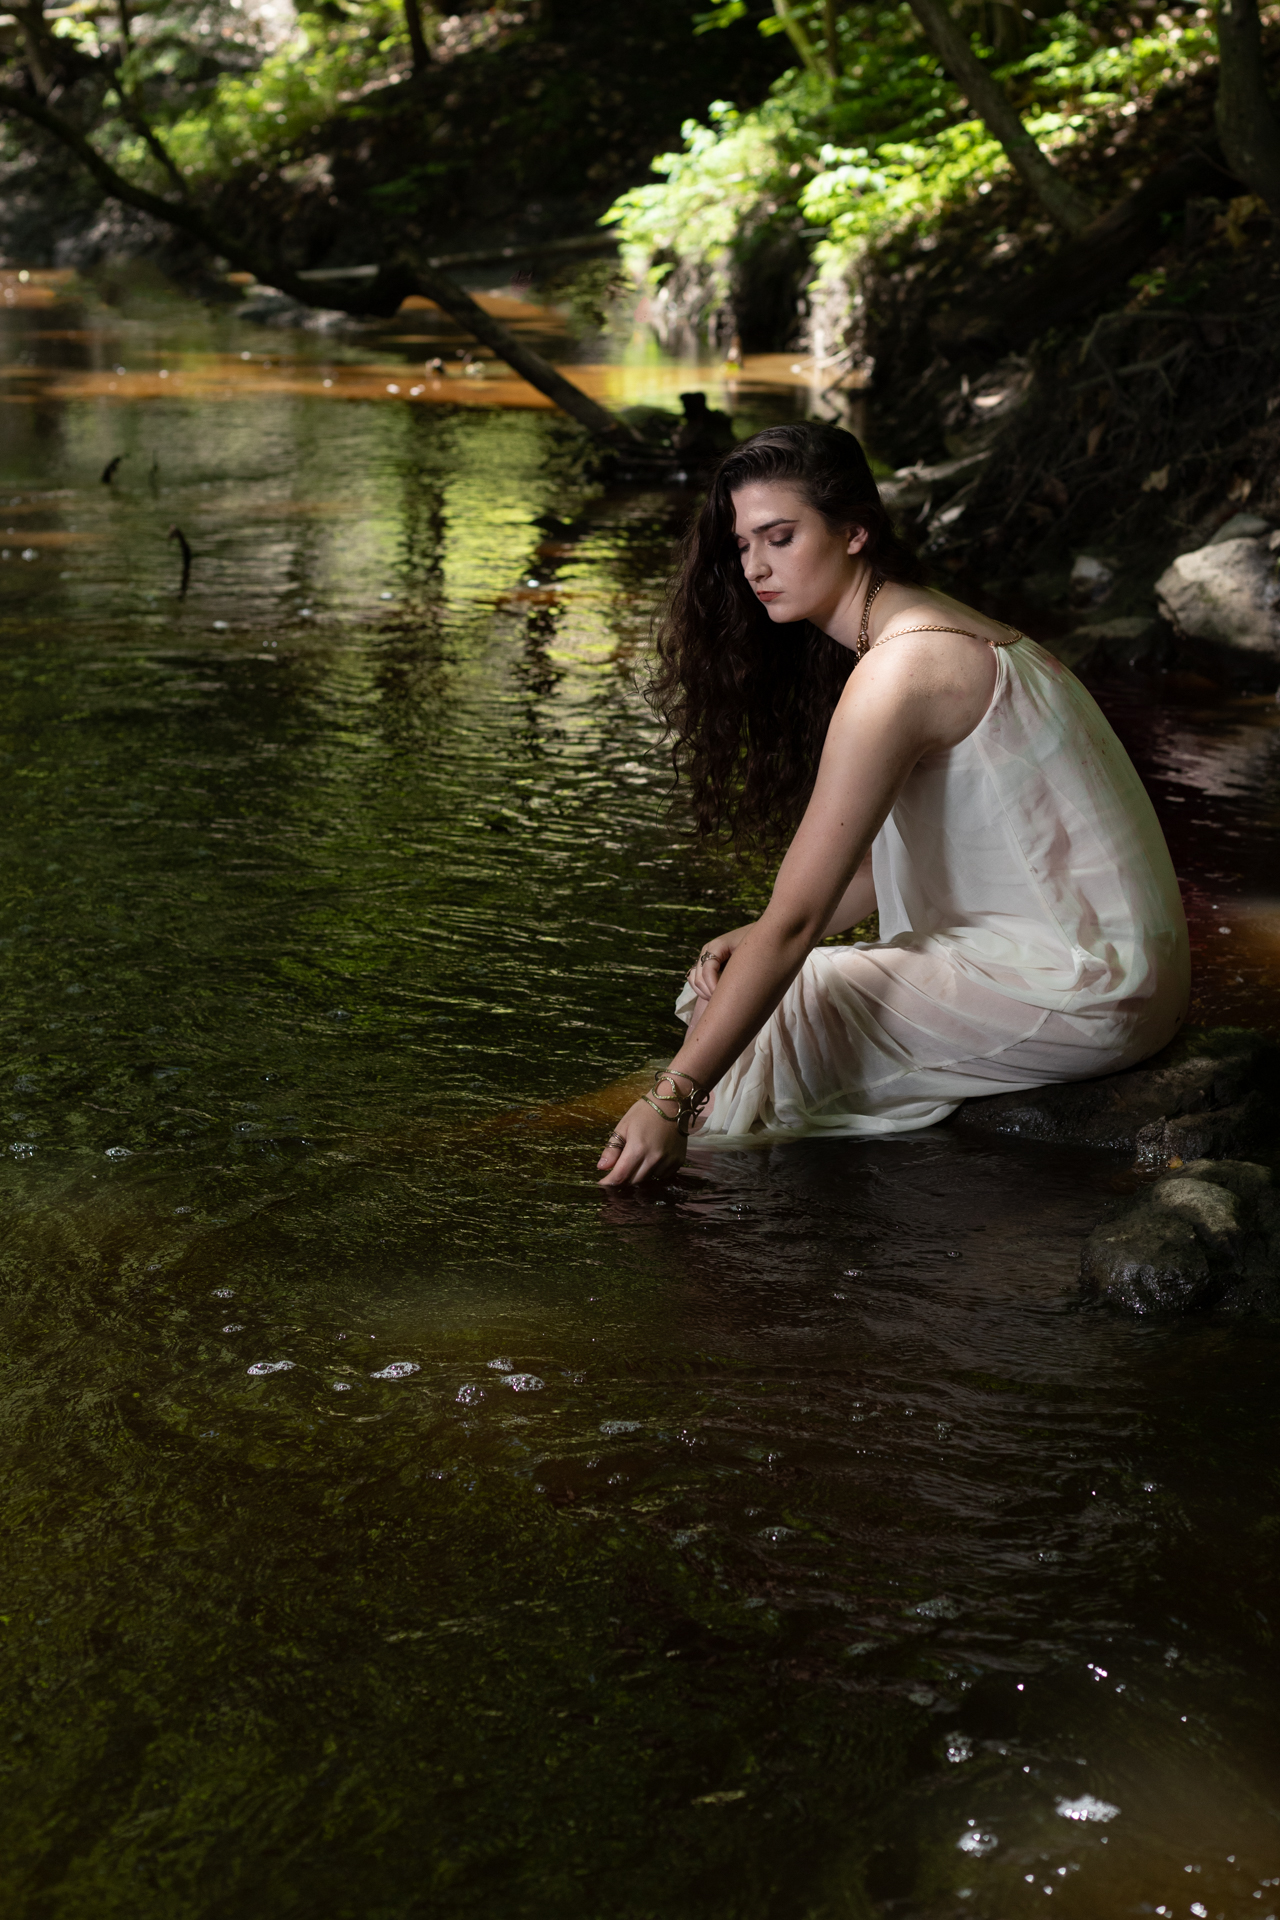 CFrenette-Marilyne-ruisseau-web-8